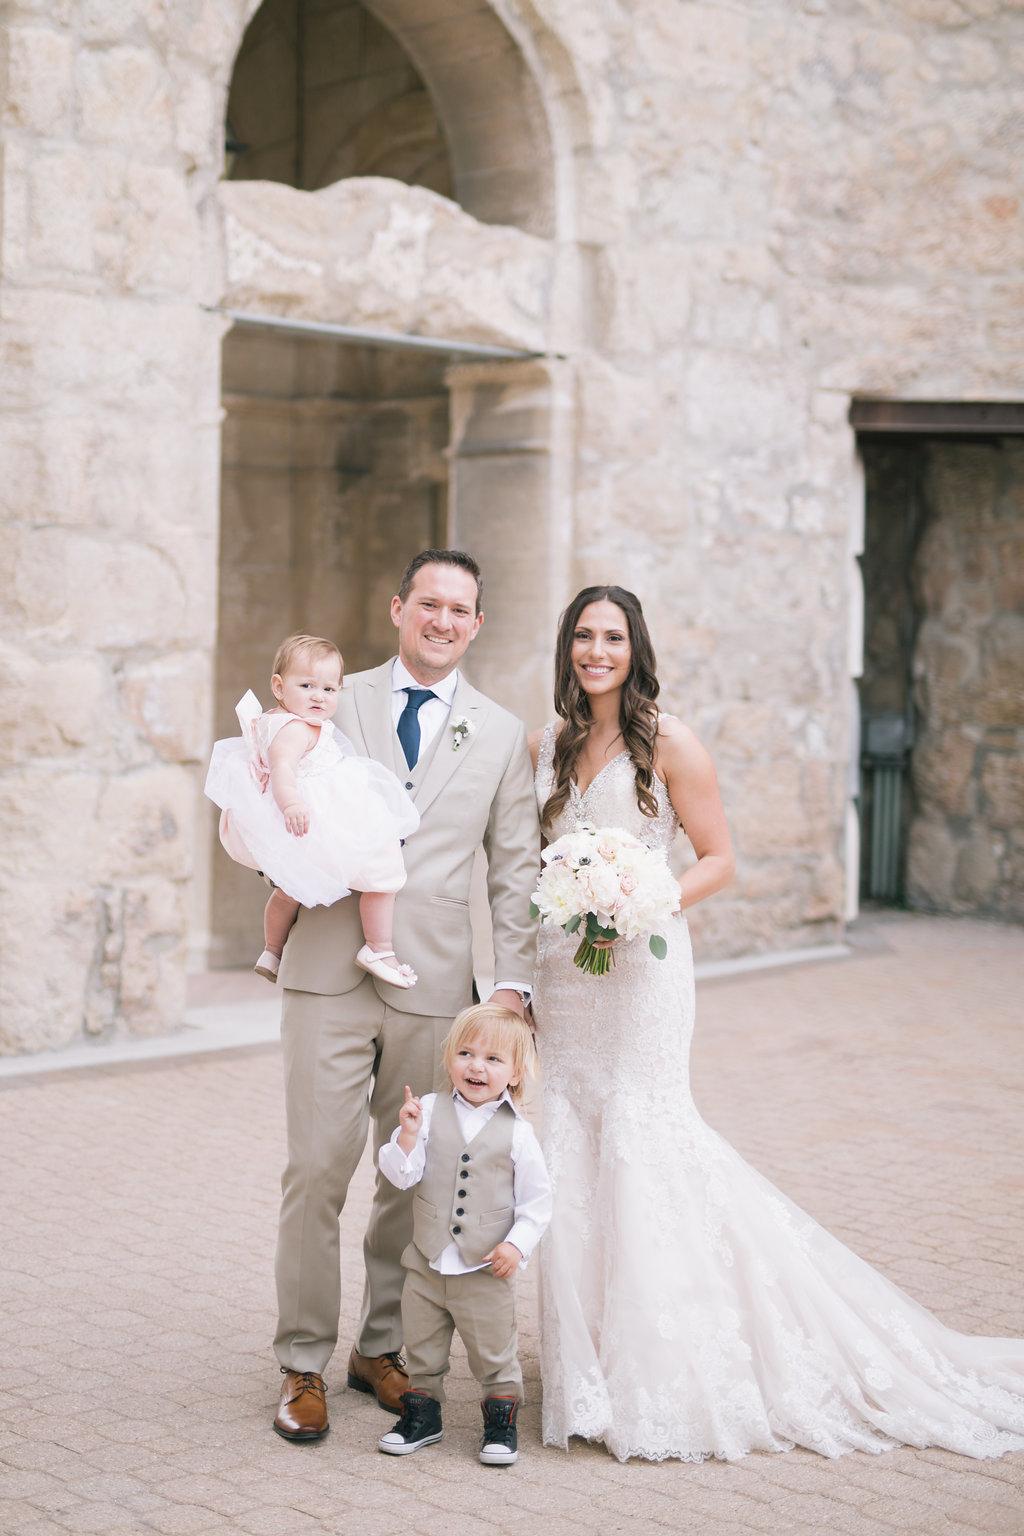 Blush and White Wedding Flowers - Wedding Florist in Winnipeg